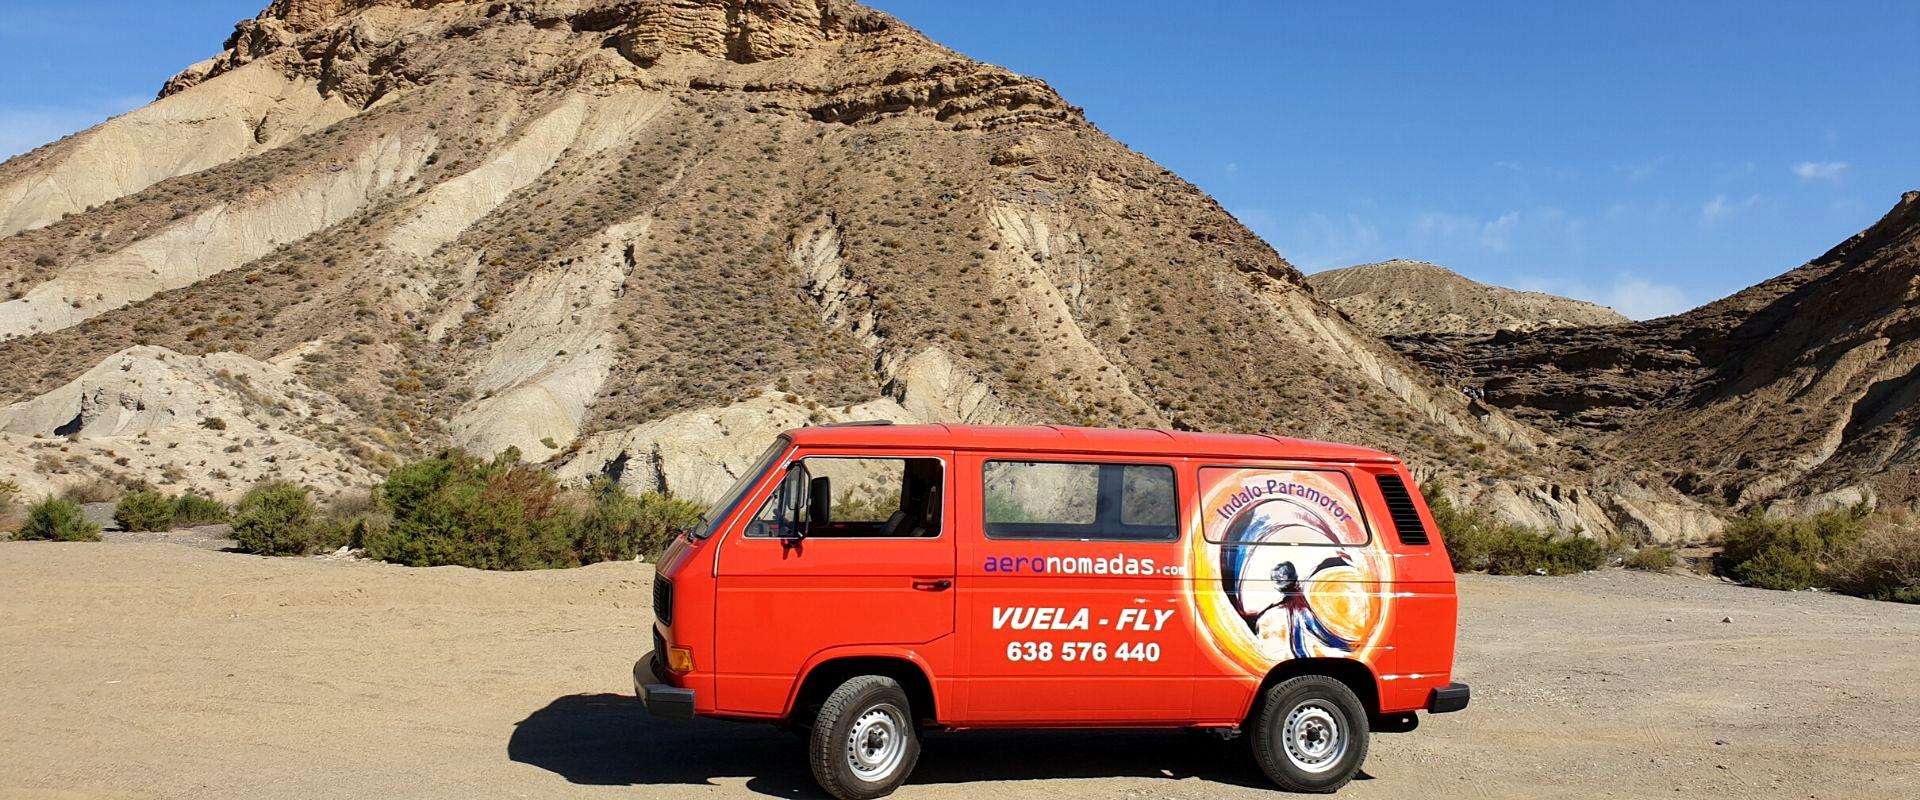 Furgoneta antigua indalo paramotor en desierto tabernas